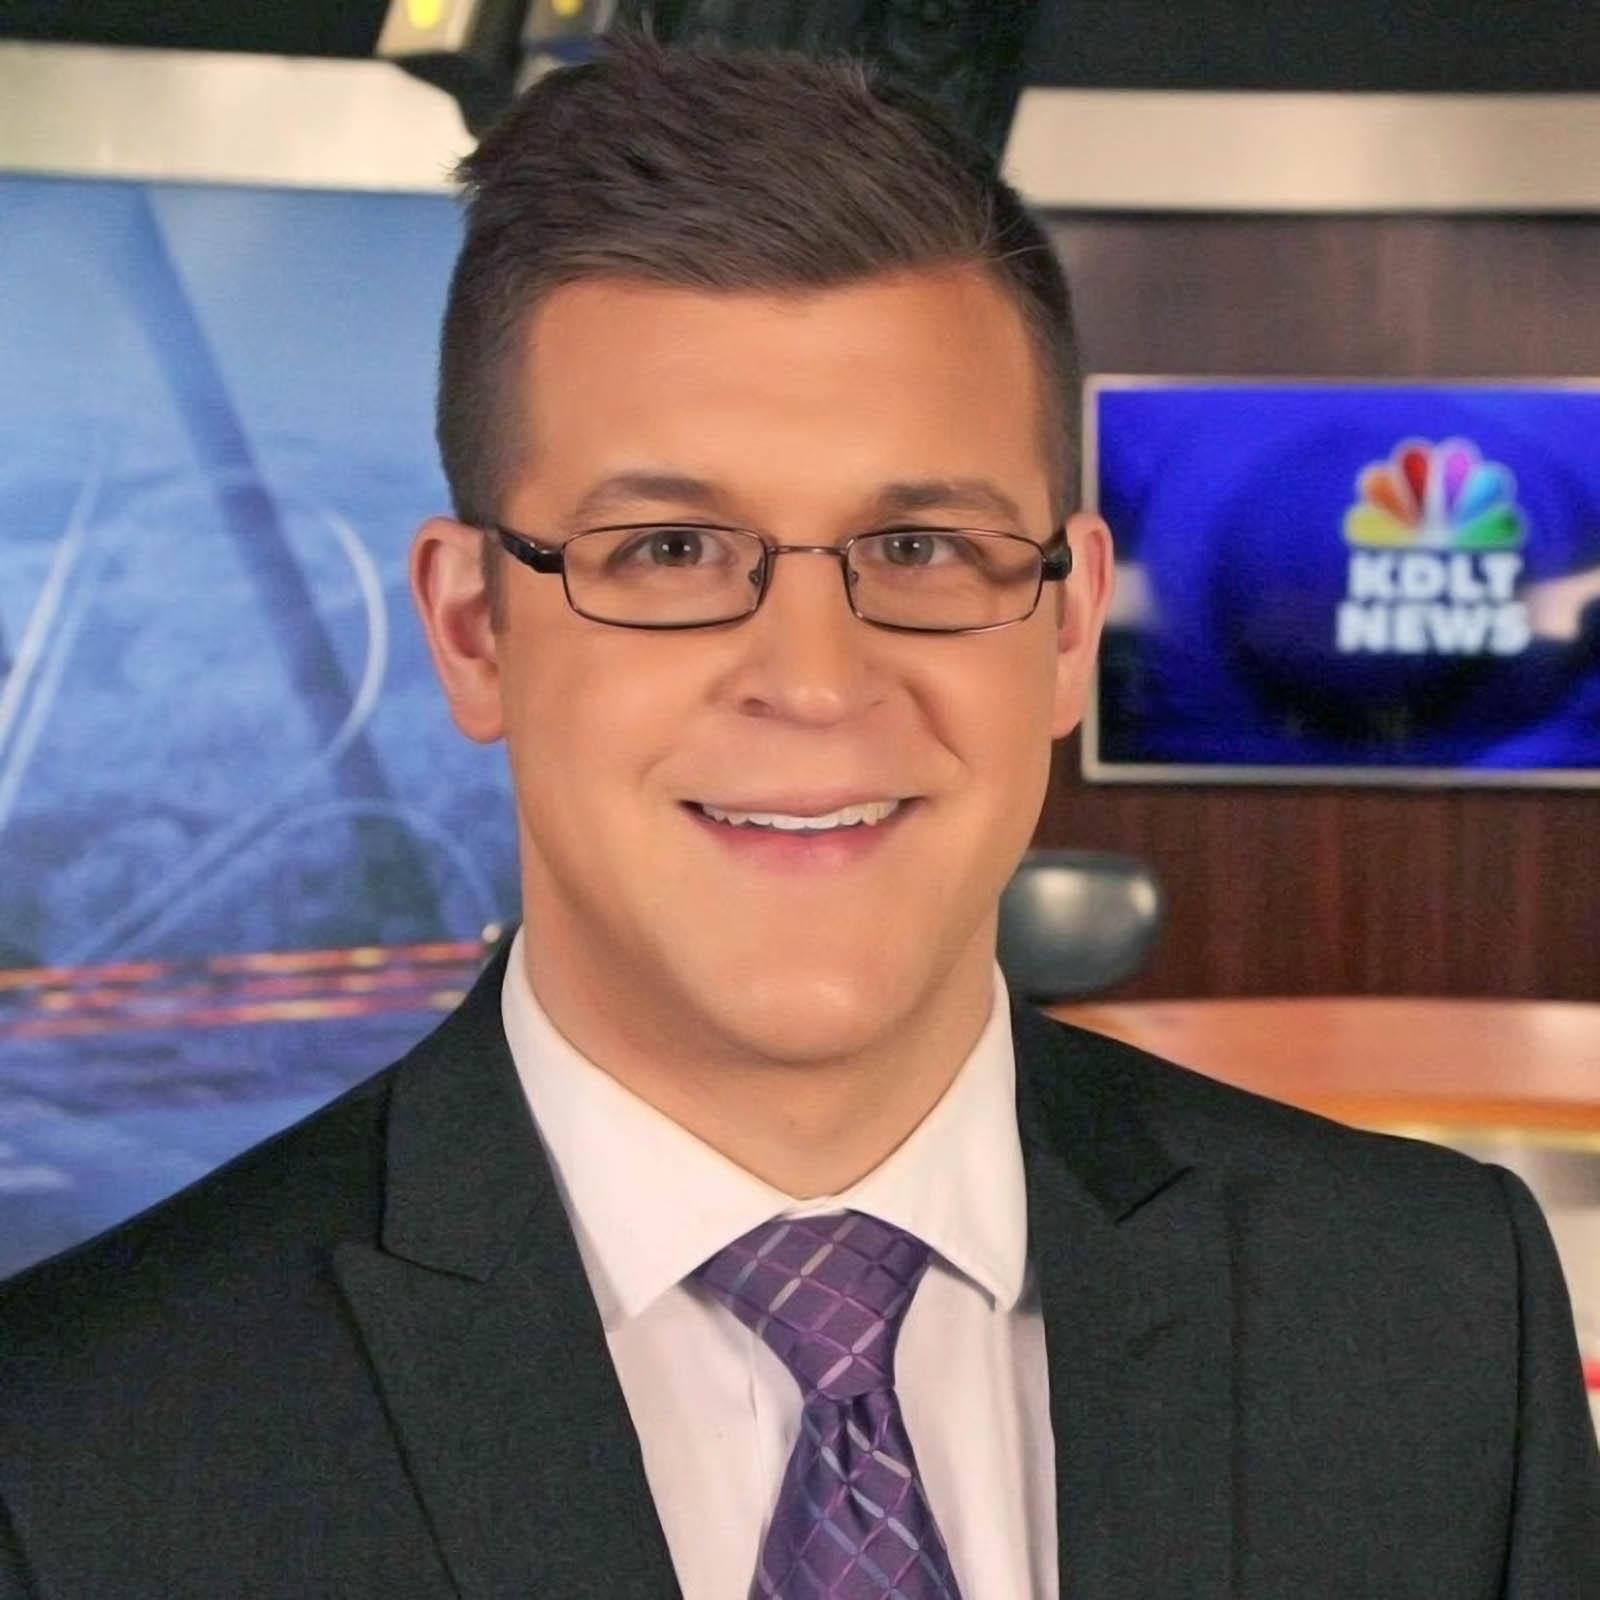 Brandon Spinner work at WAFF 48 News